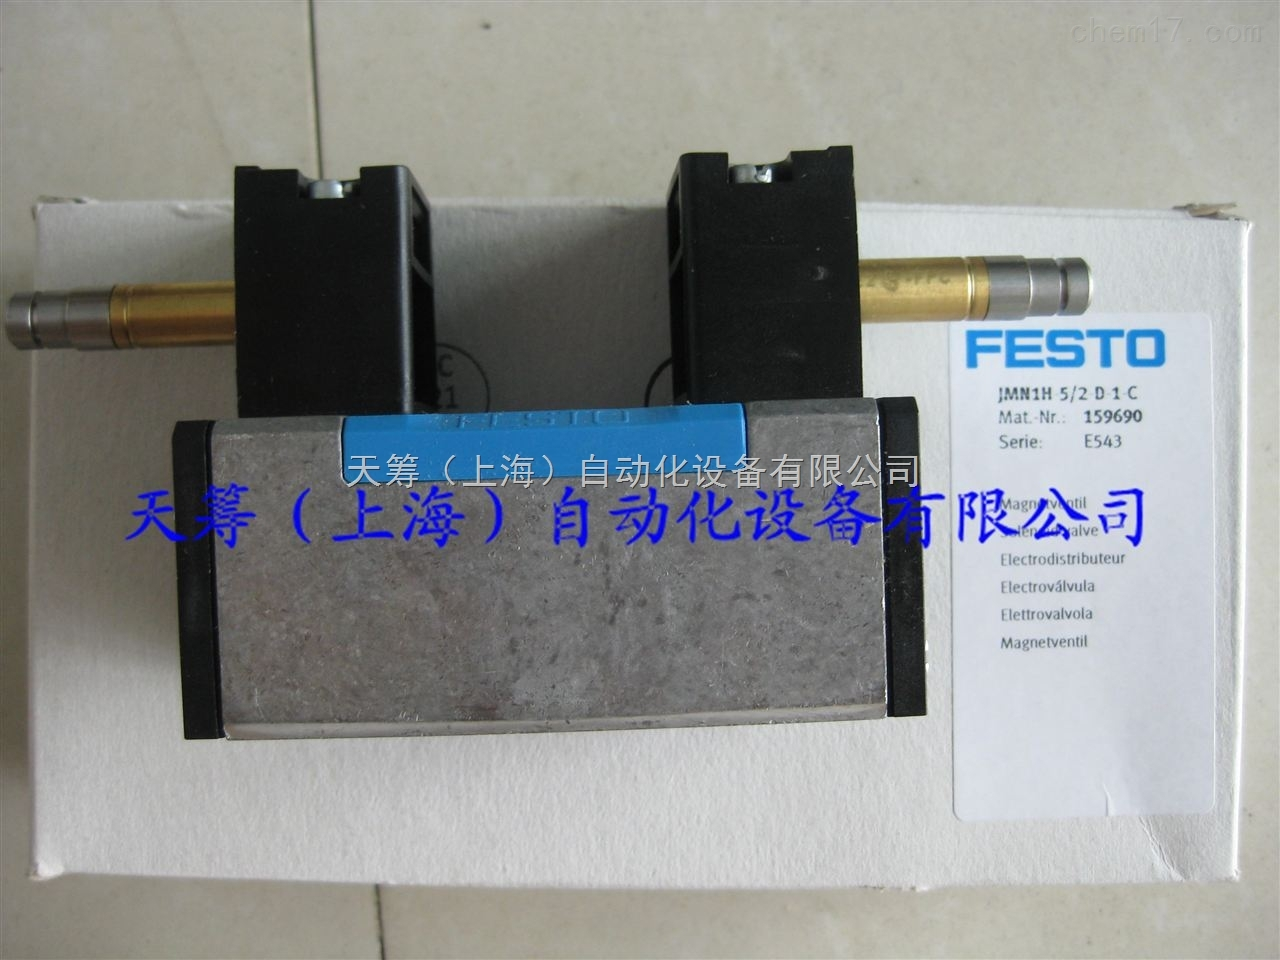 FESTO电磁阀JMN1H-5/2-D-1-C